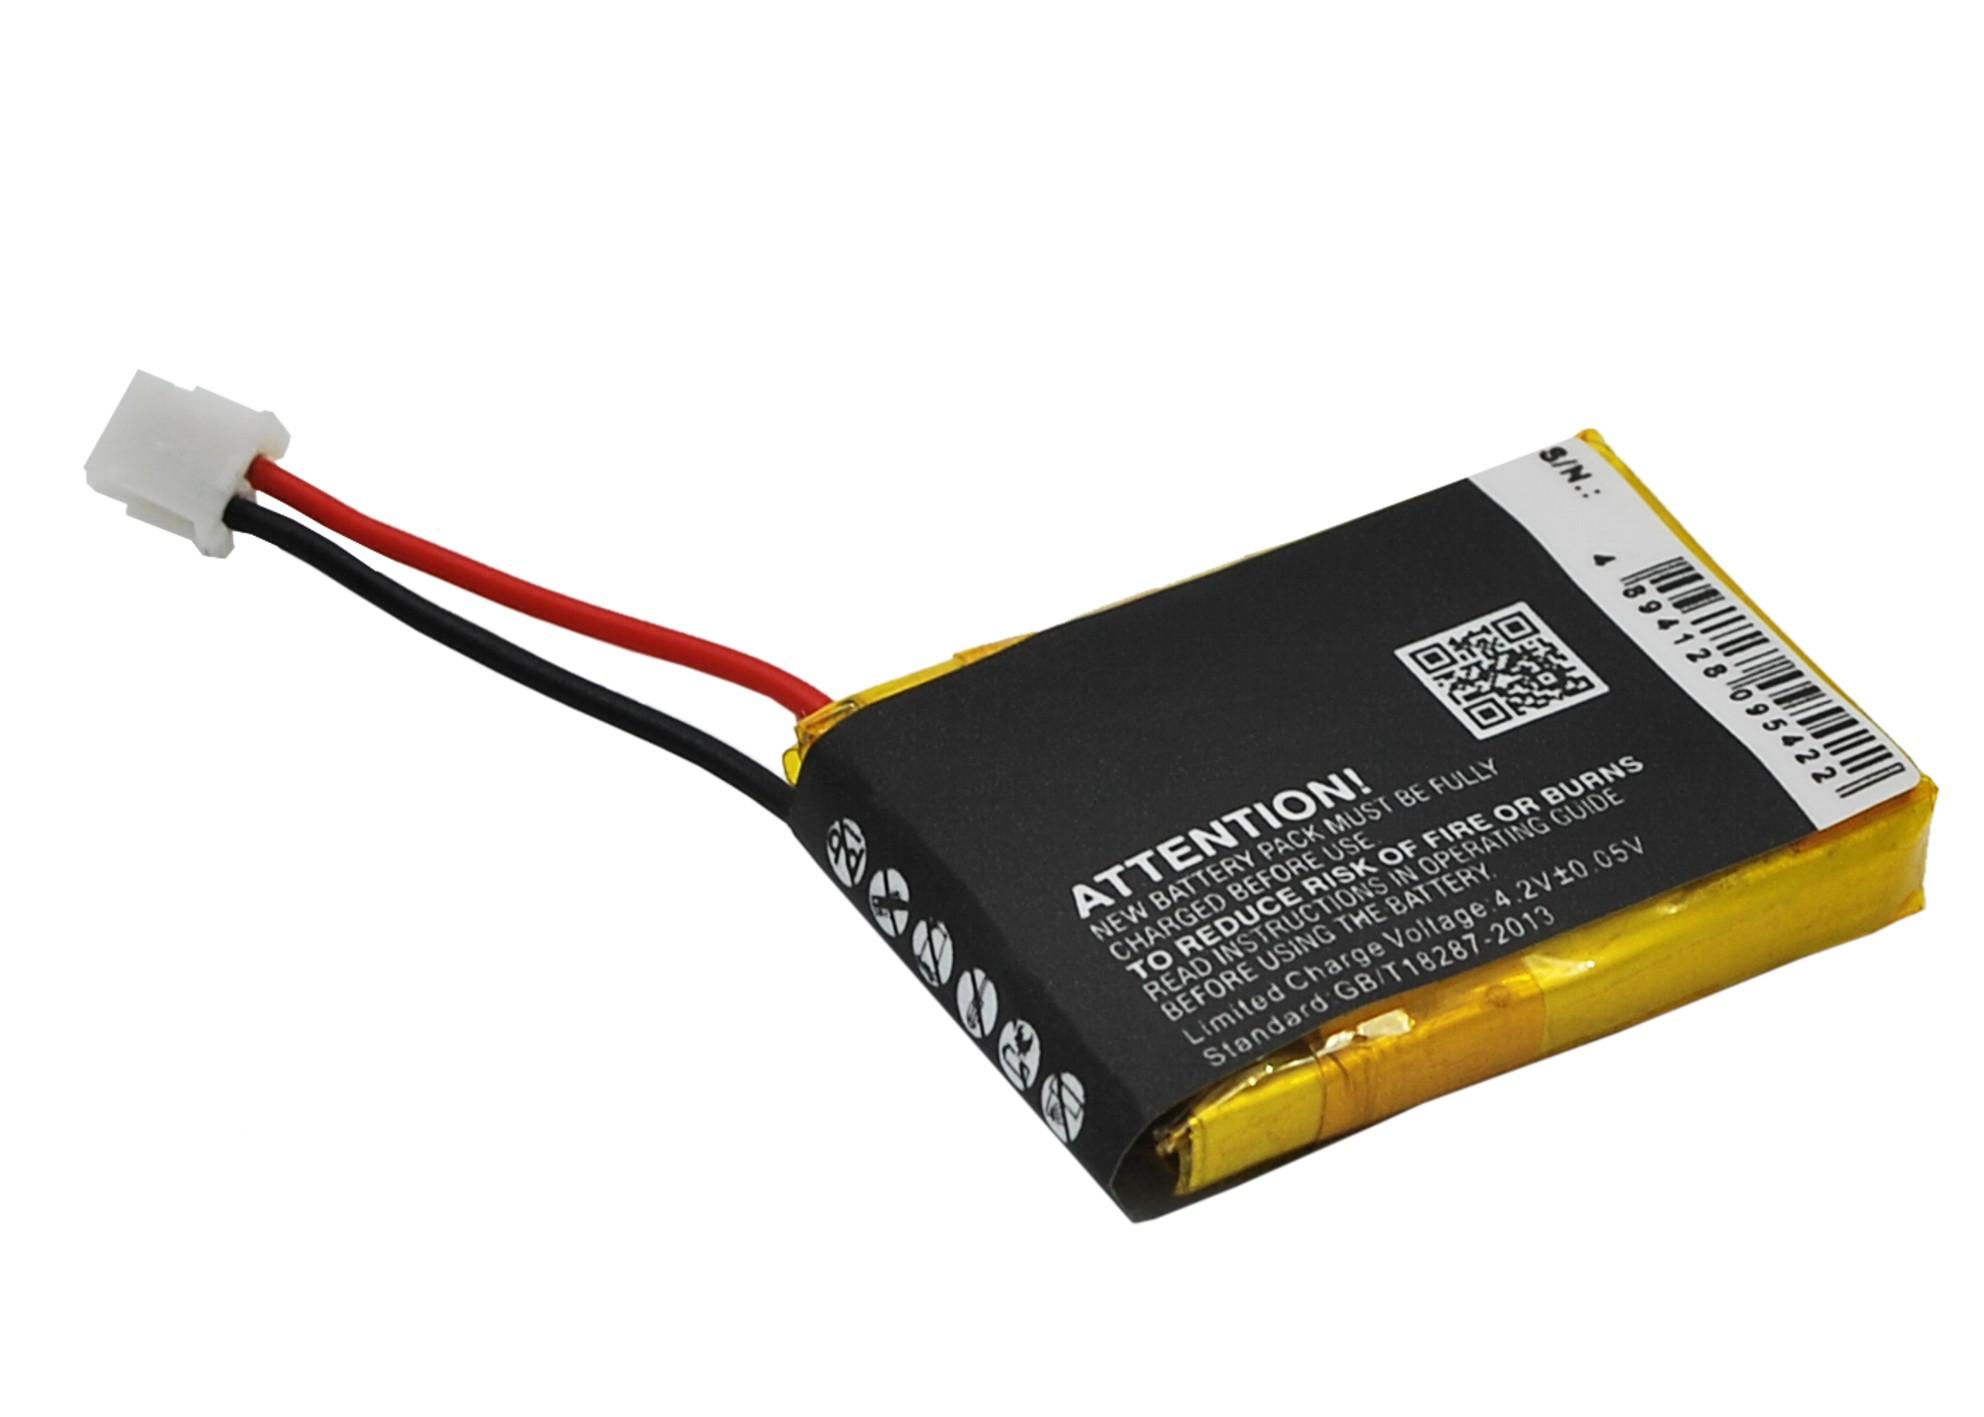 miniatura 4 - Li-Polymer Battery for SportDOG WetlandHunter 425CAMO WetlandHunter SD-425Camo T